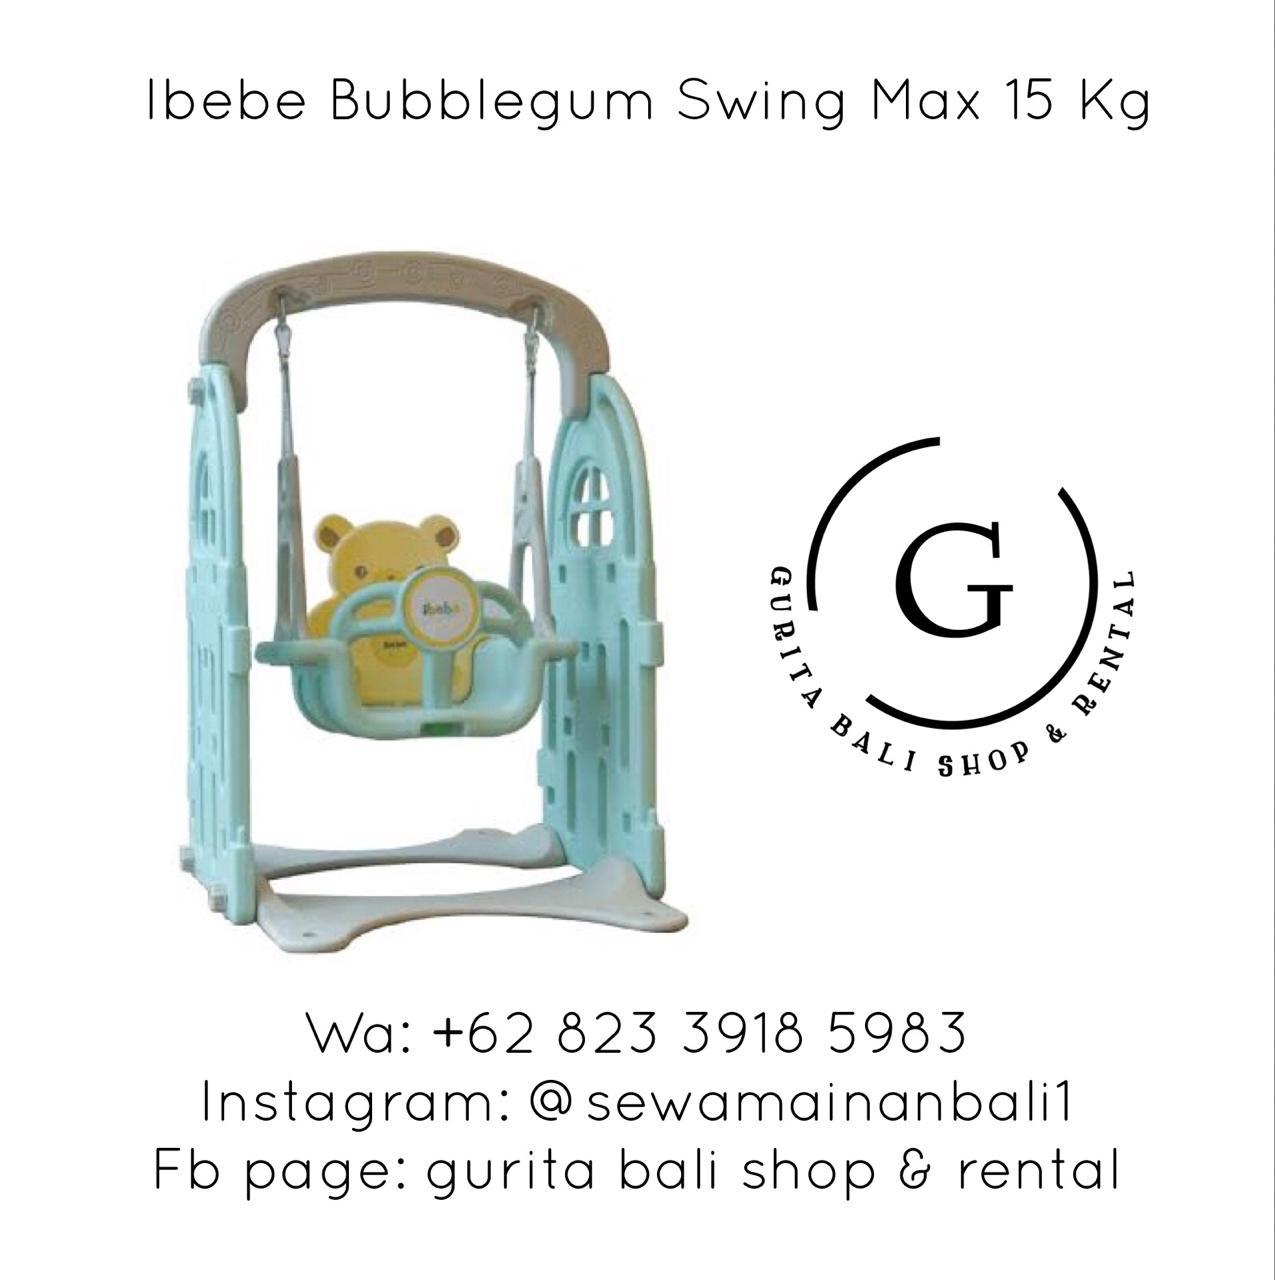 IBEBE BUBBLEGUM SWING ONLY